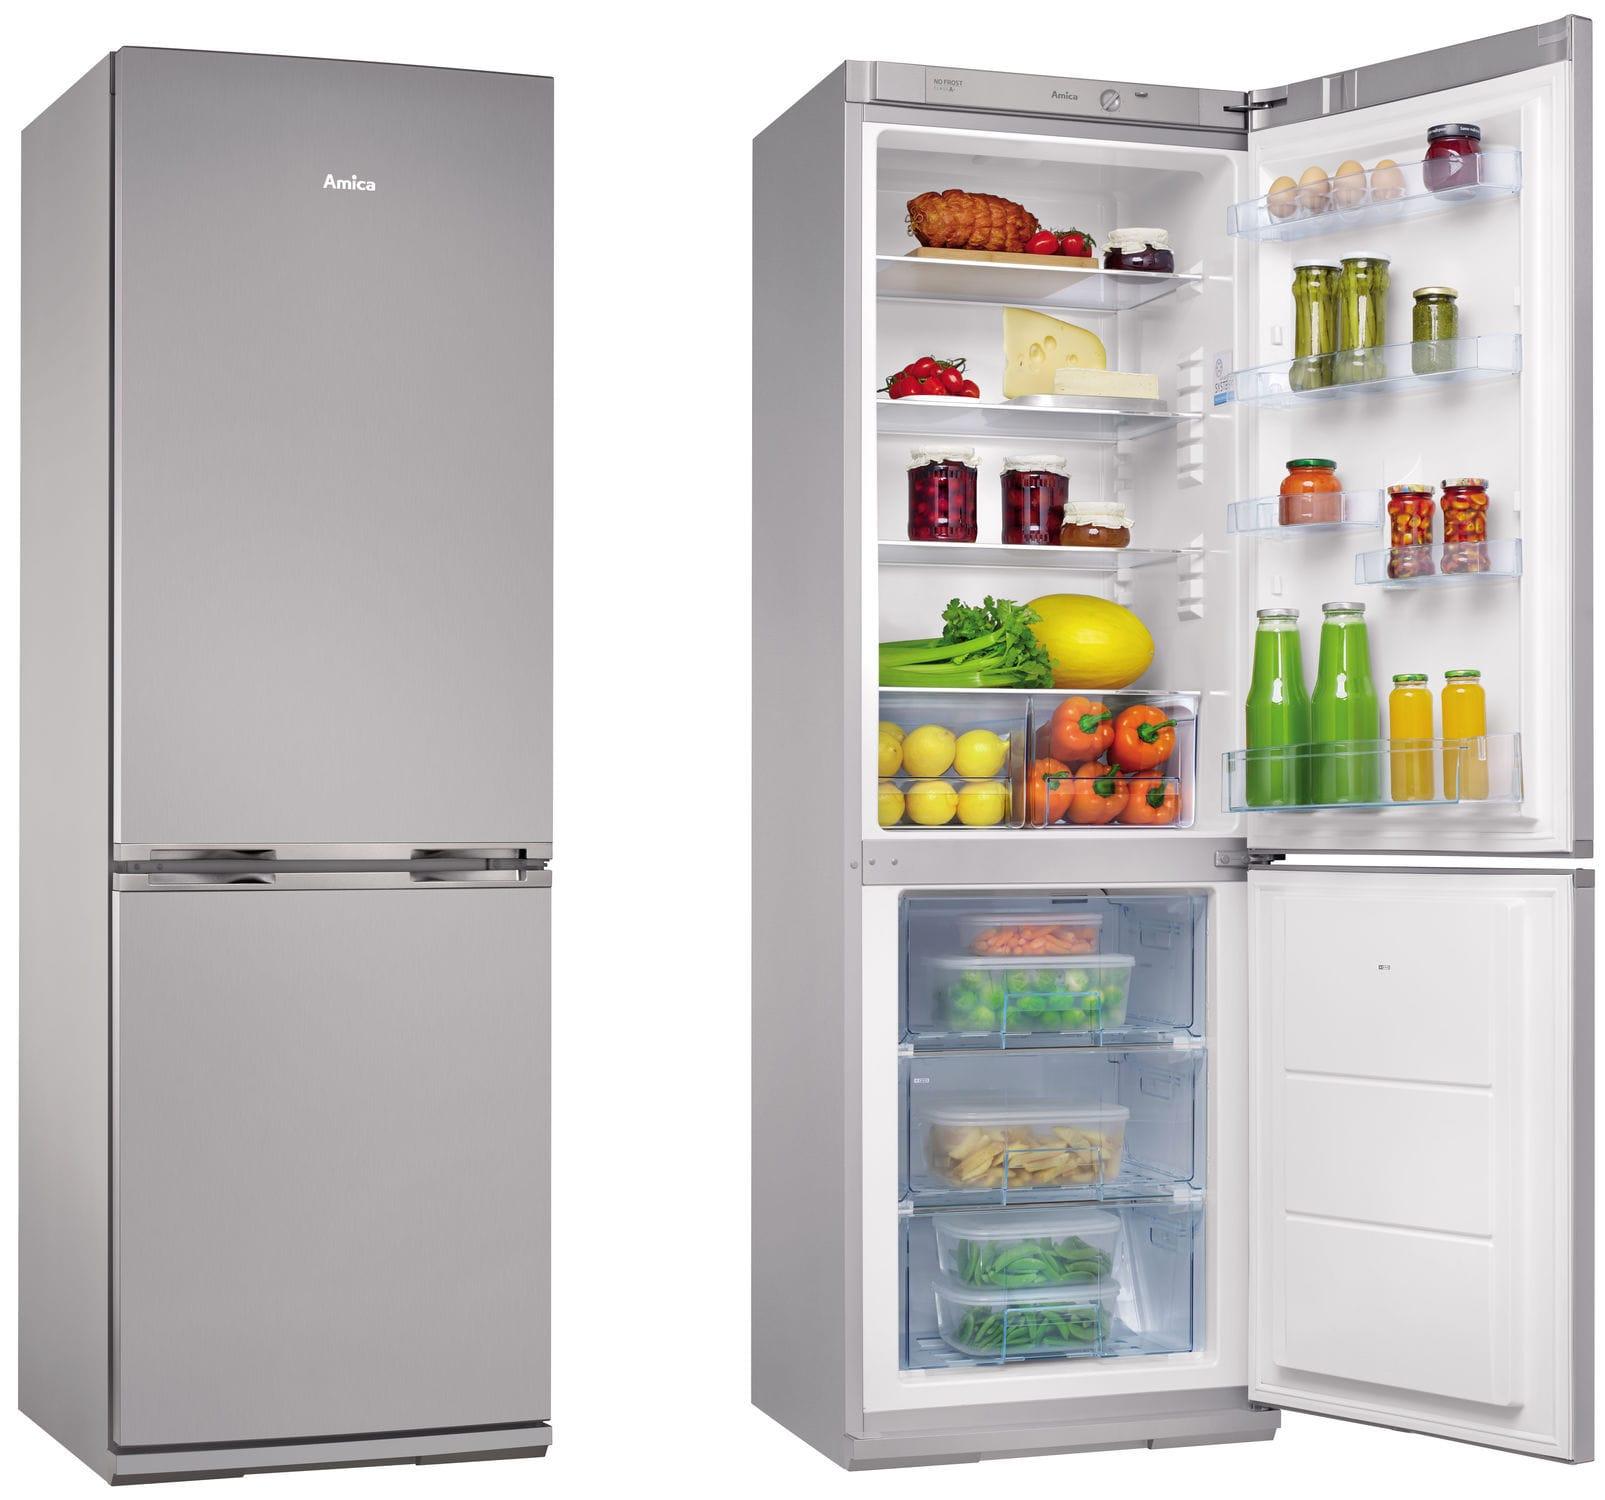 Superbe Residential Refrigerator Freezer / Double Door / Bottom Freezer   FK328.4FX